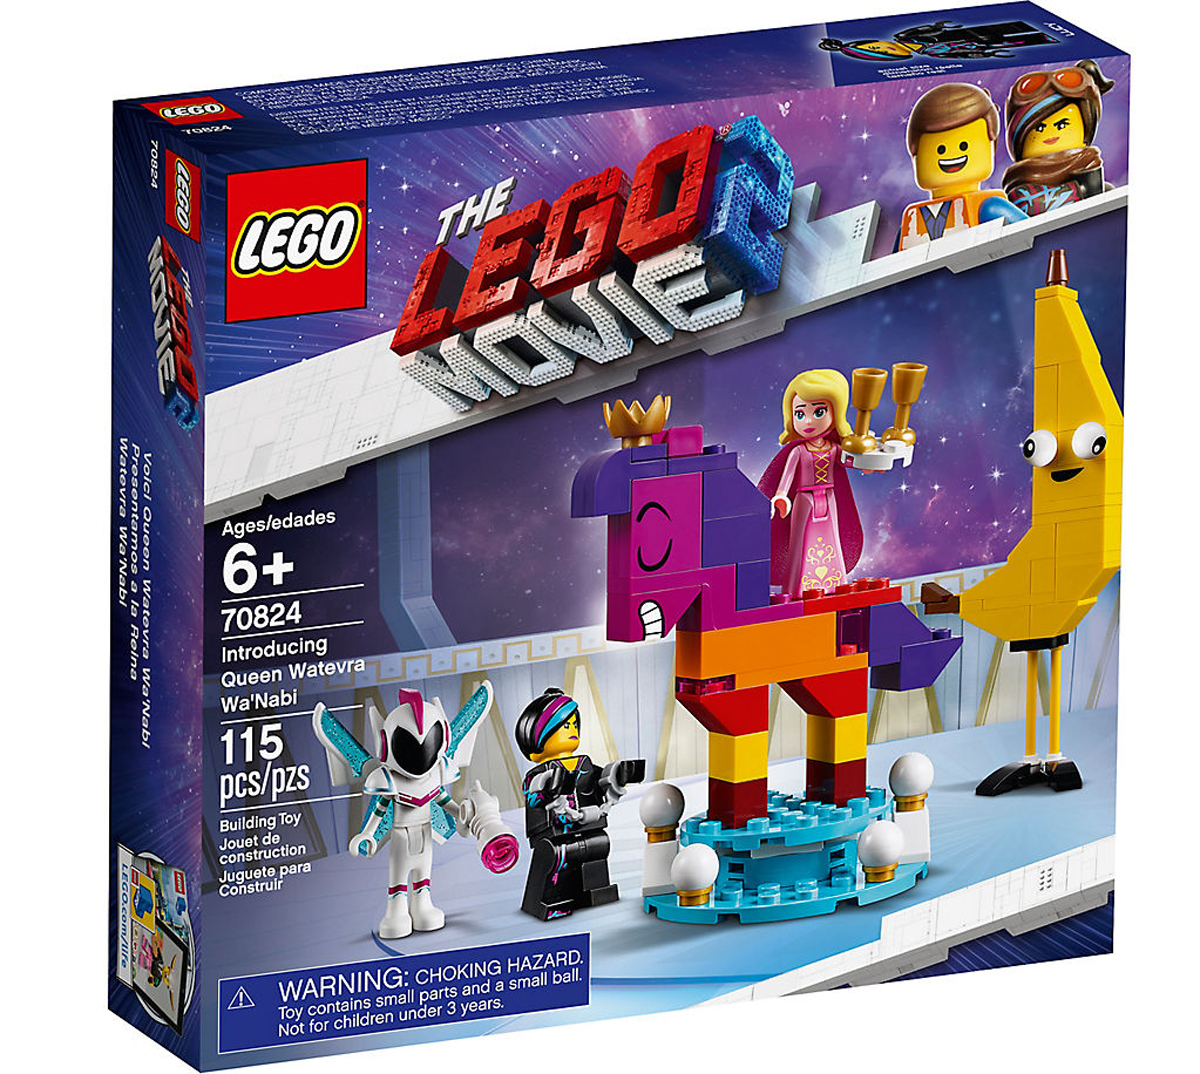 Happenings Brick Newsamp; Show The Of Page 50 307 Lego UMzVSLpGq